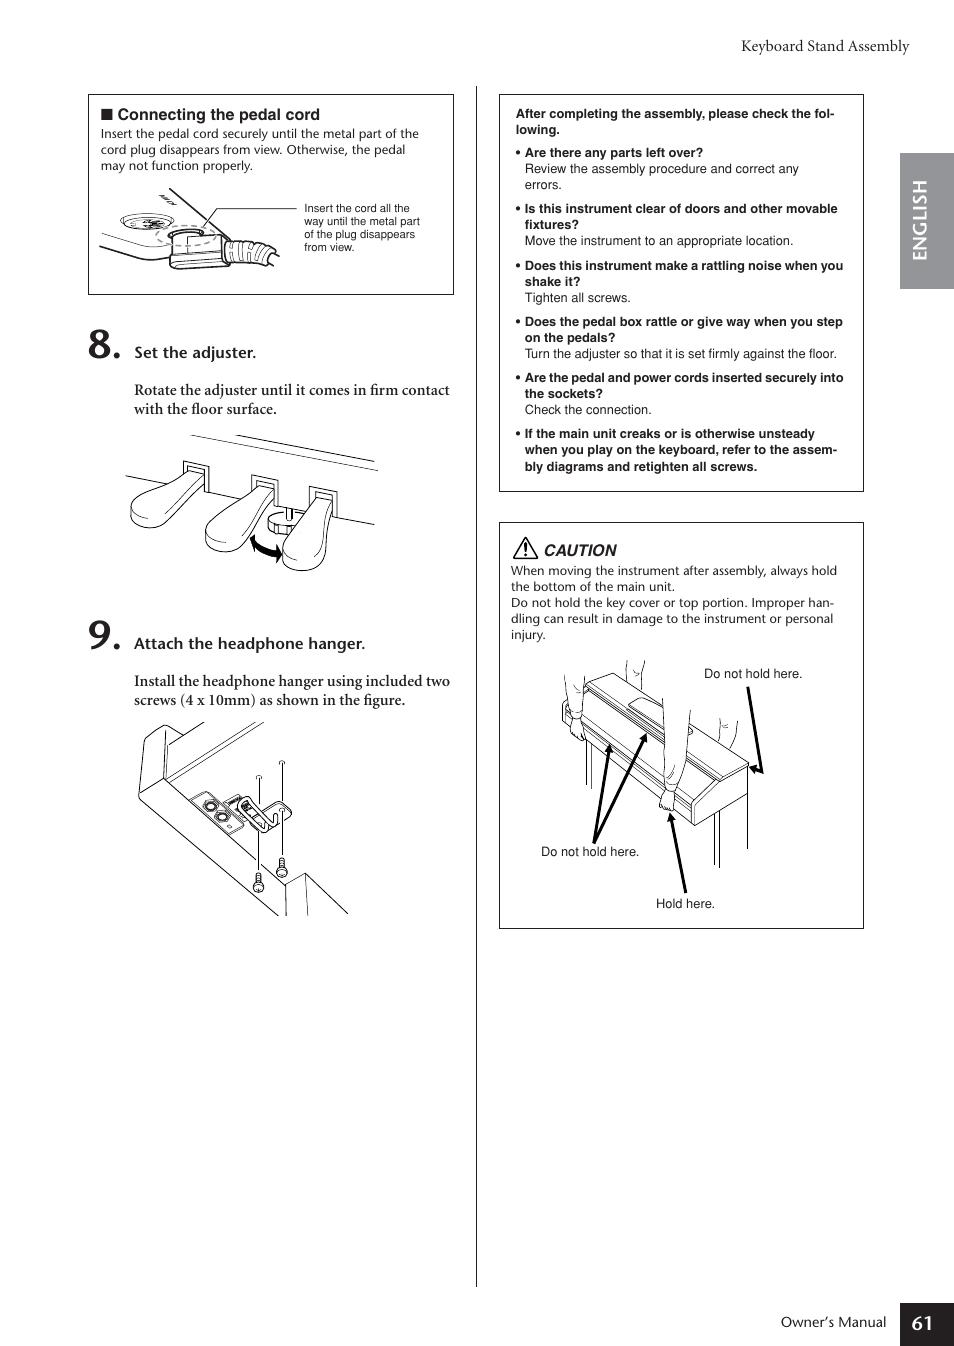 61 english keyboard stand assembly caution yamaha arius ydp 181 rh manualsdir com yamaha neos instruction manual yamaha instruction manual dgx-620